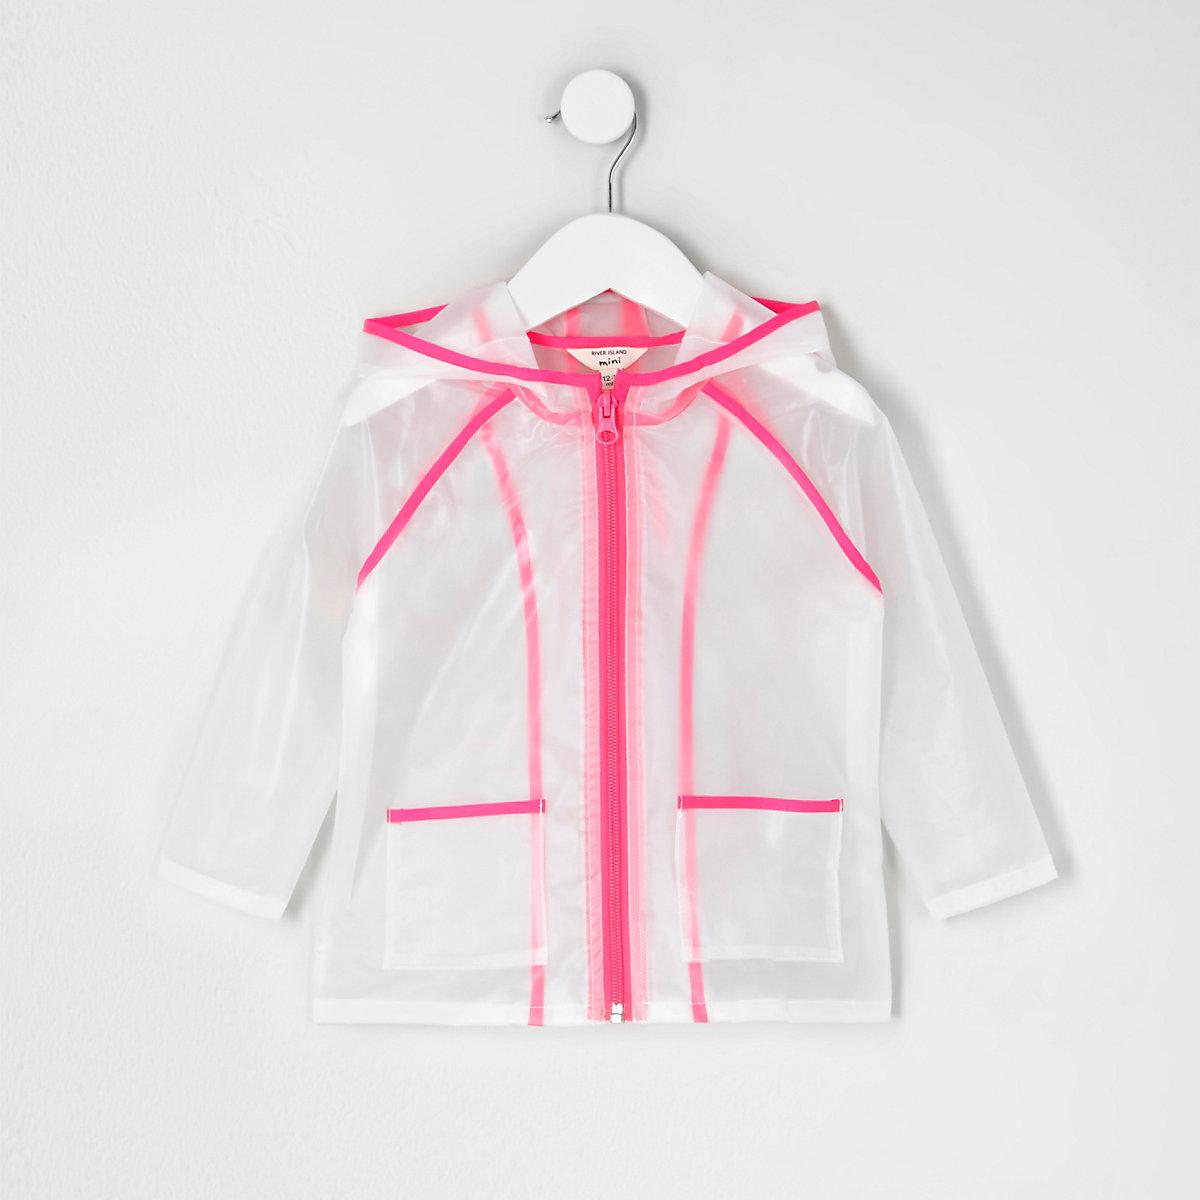 Pinker, transparenter Regenmantel